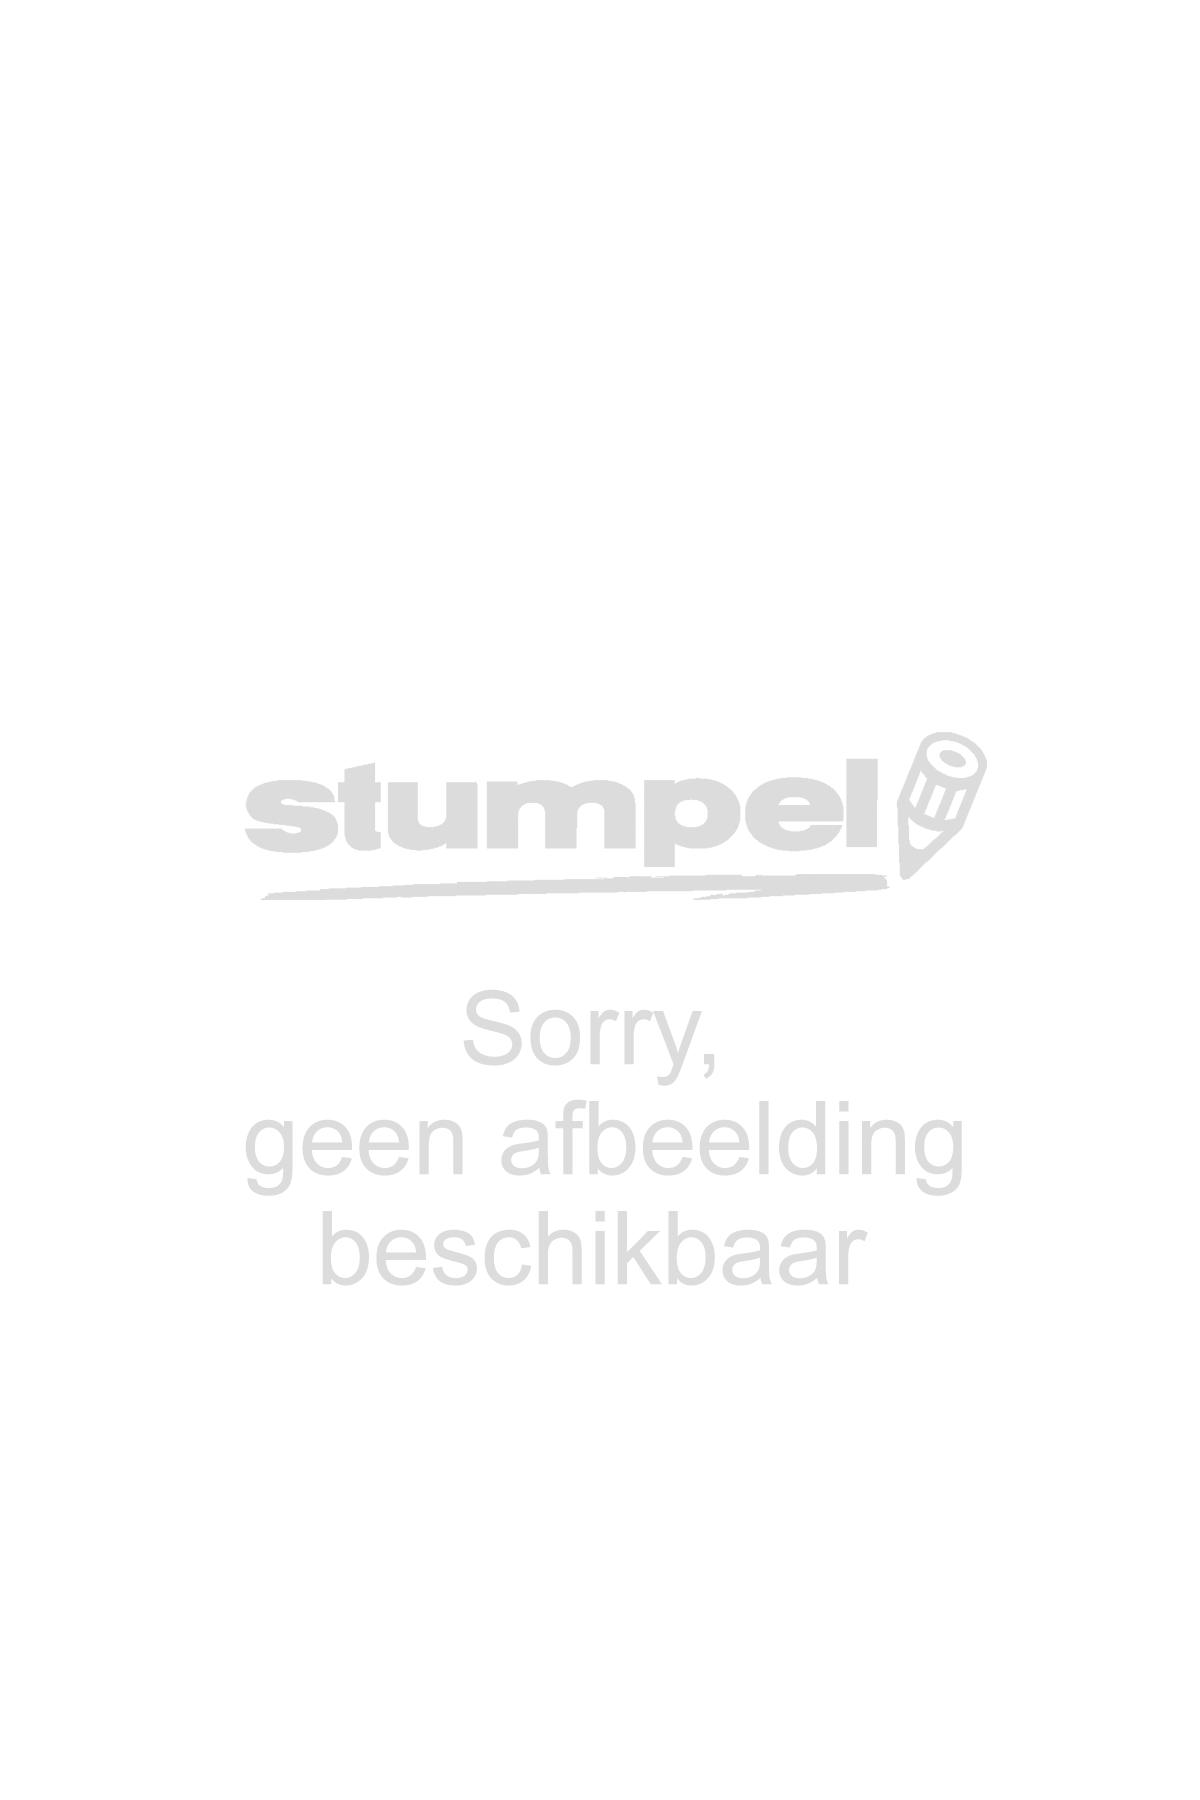 whiteboardstift-lega-tz-100-m-droog-uitwisbaar-rood-920312